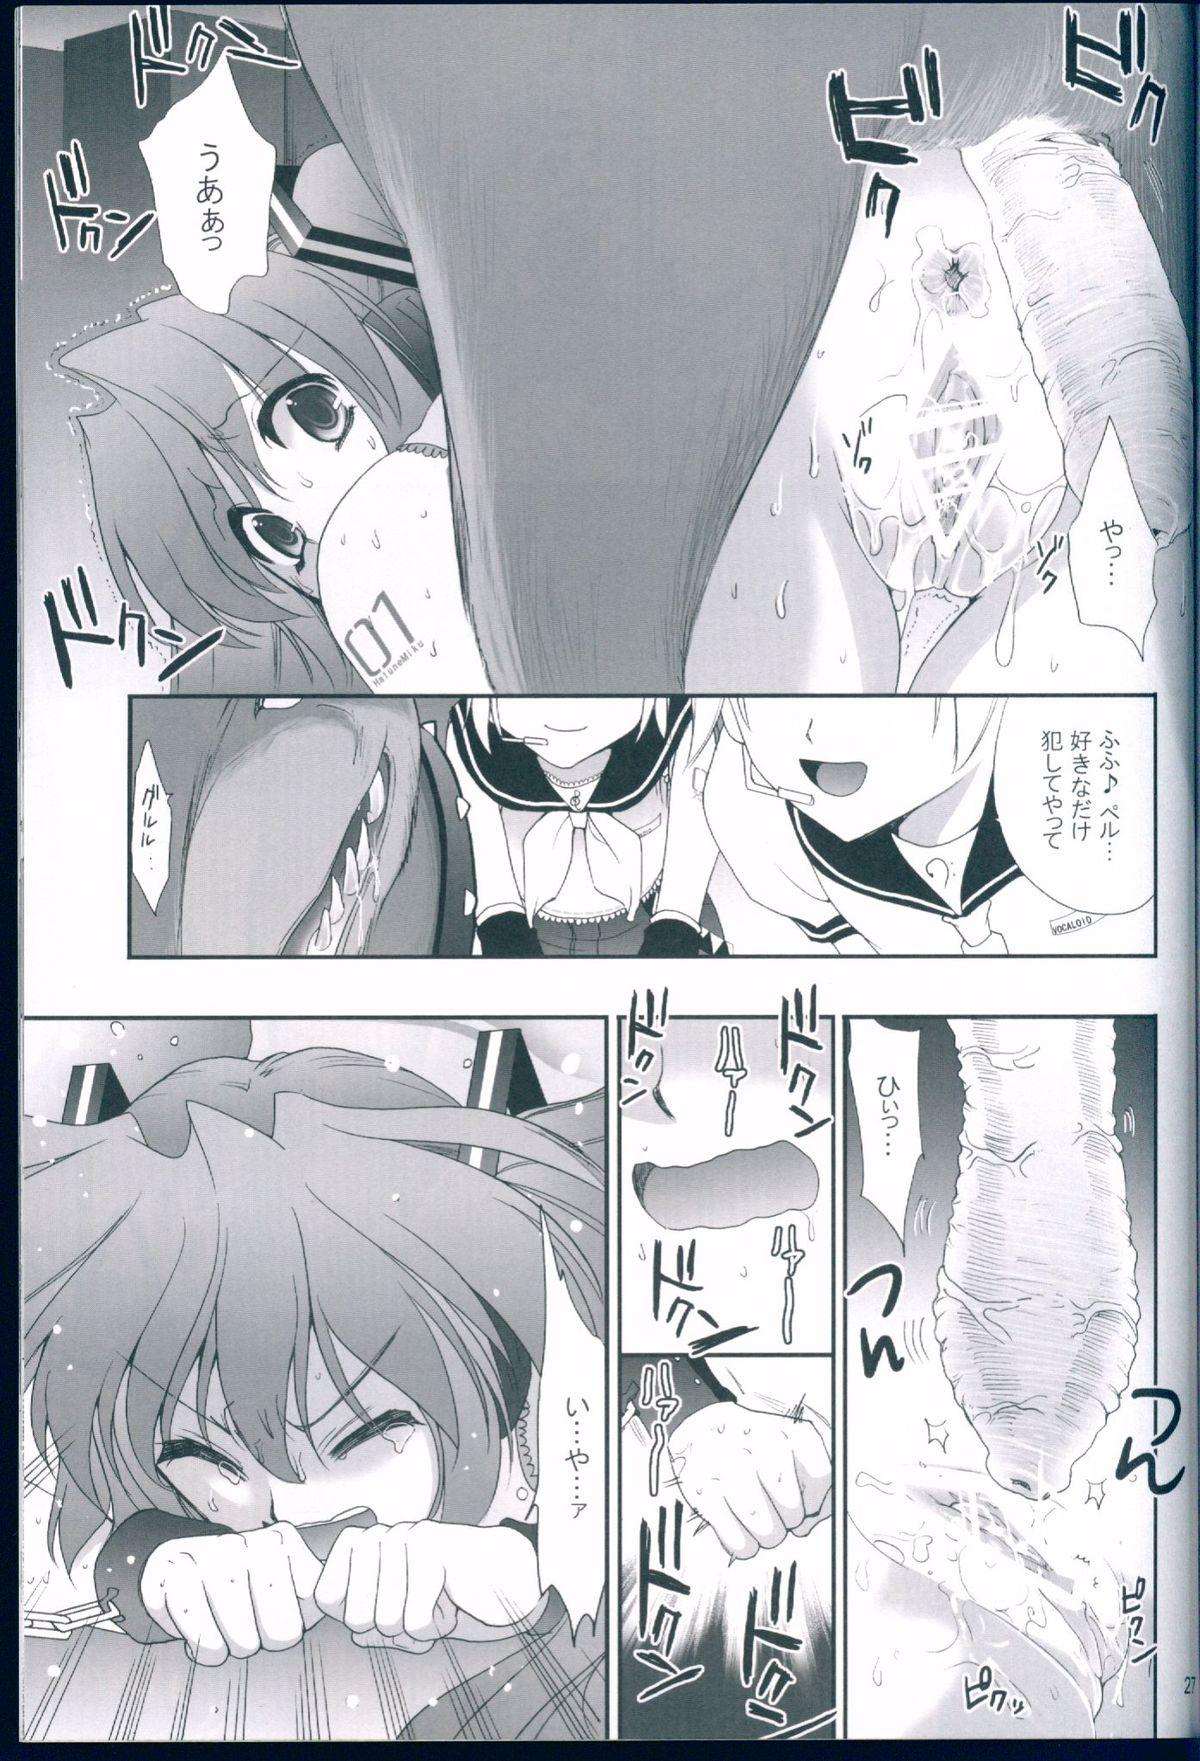 R Juu - Hatsune Miku Kenkan 24